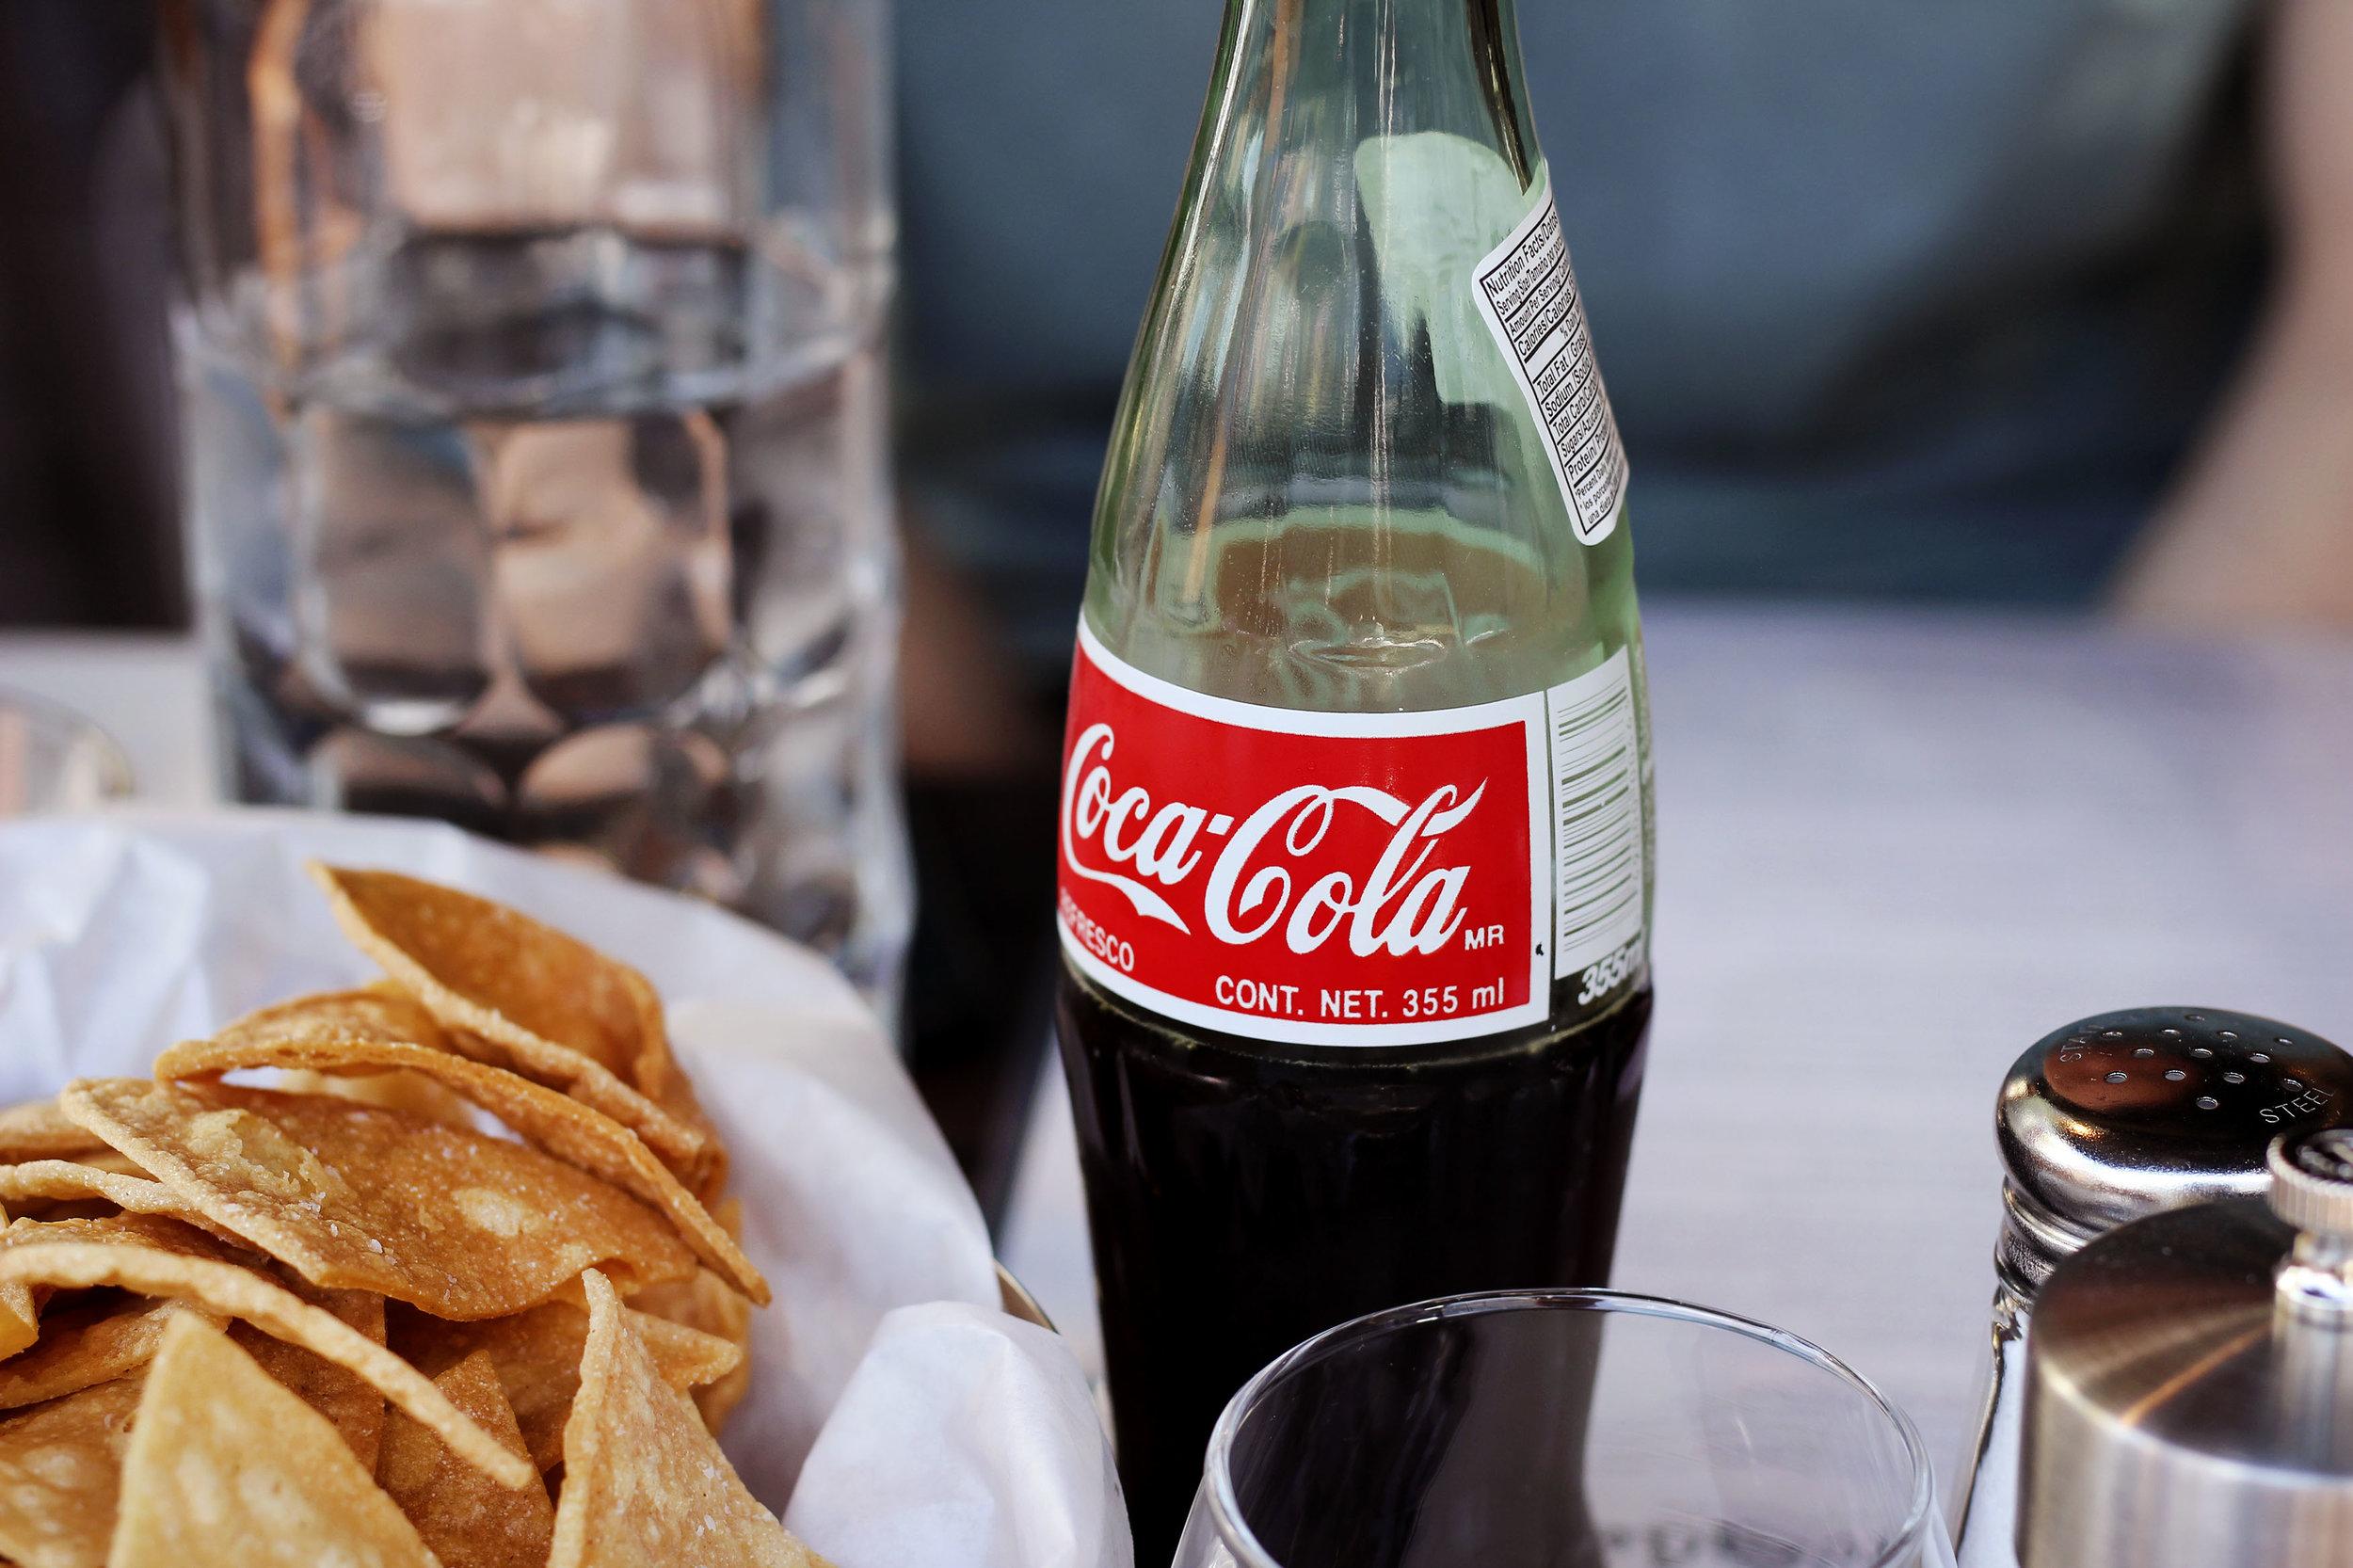 Mexican Coke - Cane sugar for the win.